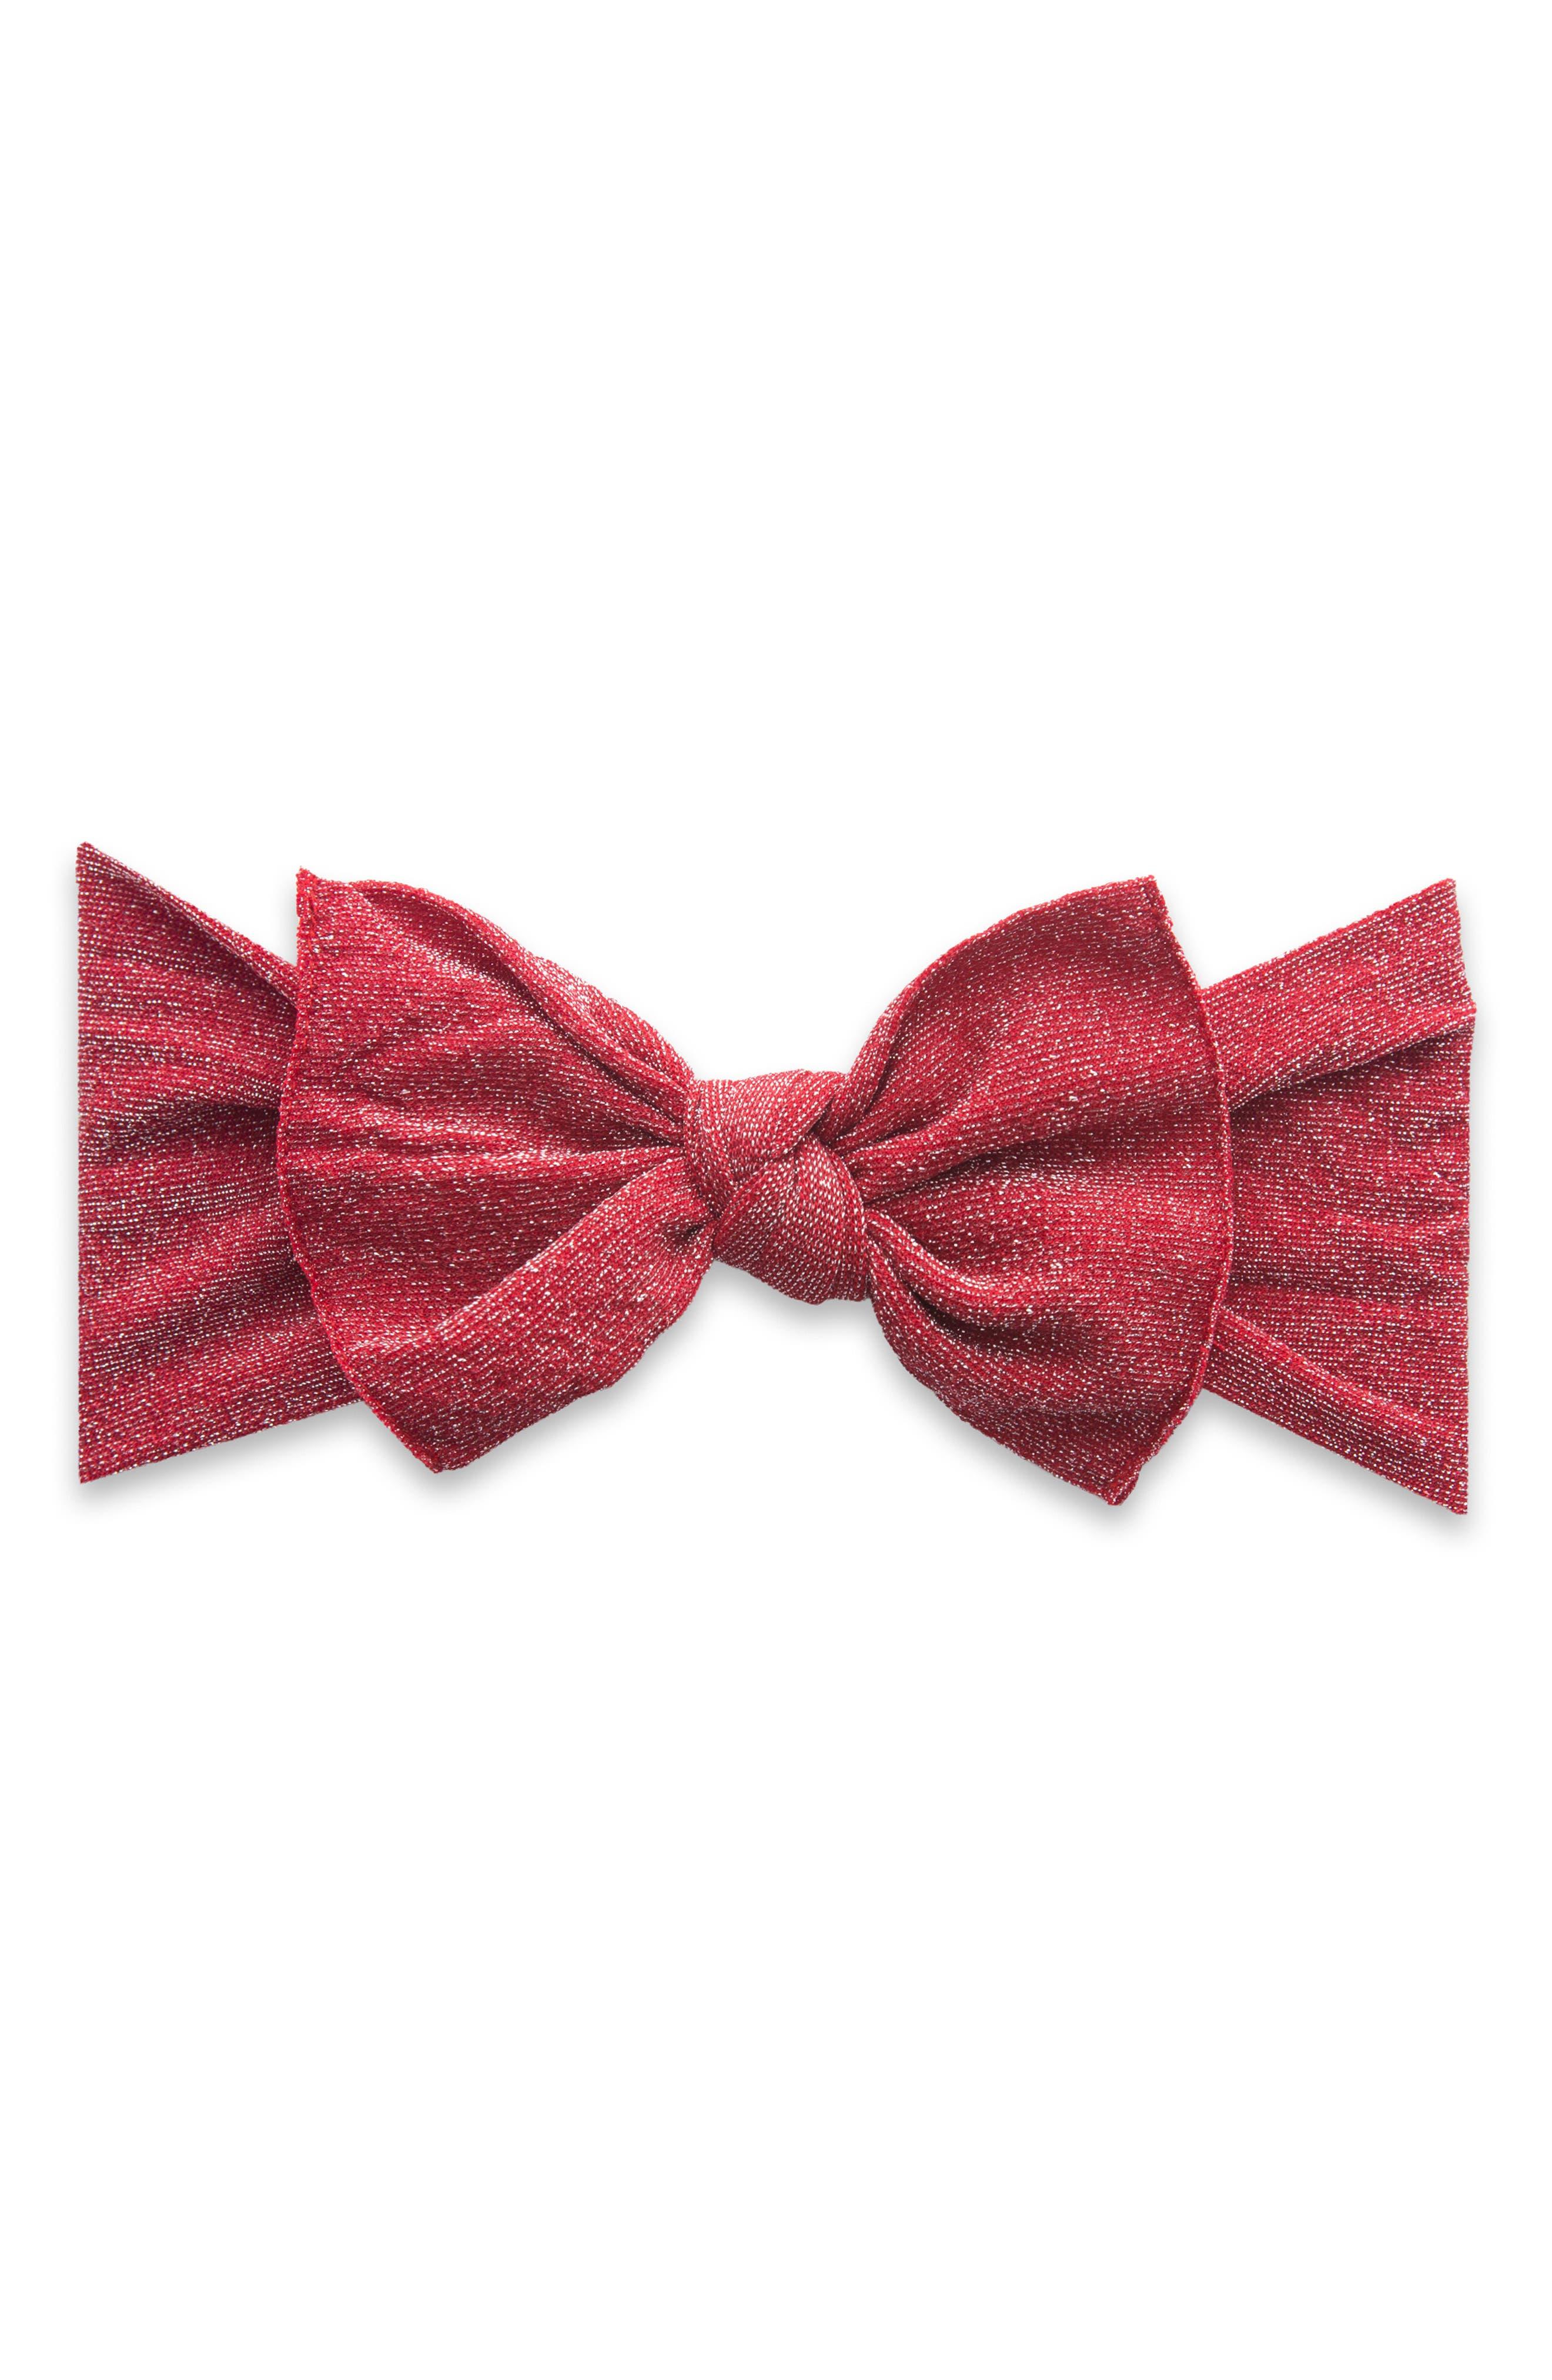 BABY BLING, Shimmer Knot Headband, Main thumbnail 1, color, RED